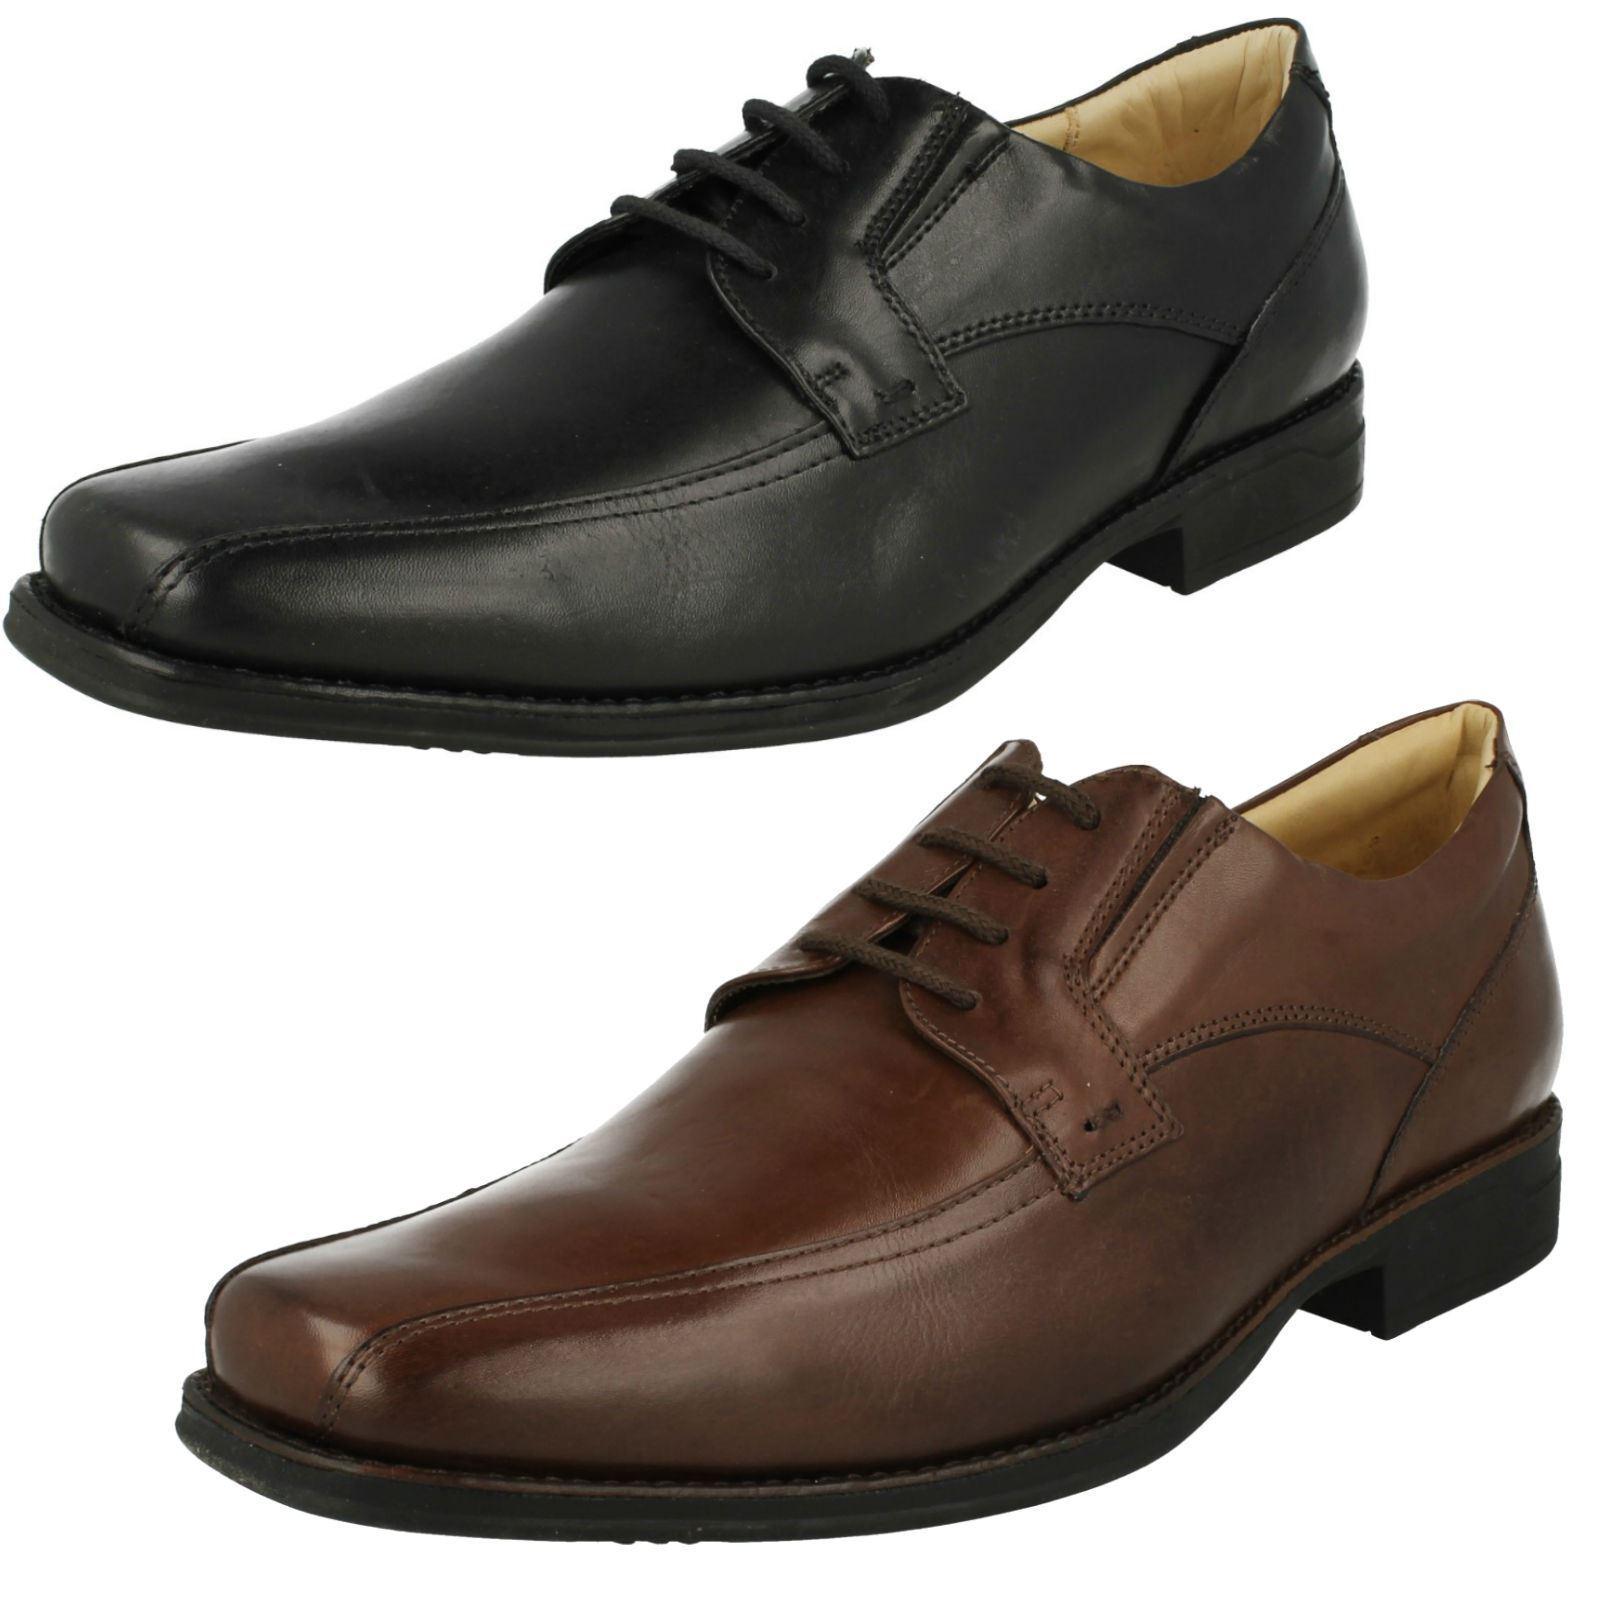 Mens Anatomic Smart Formal Lace Up Shoes Platina